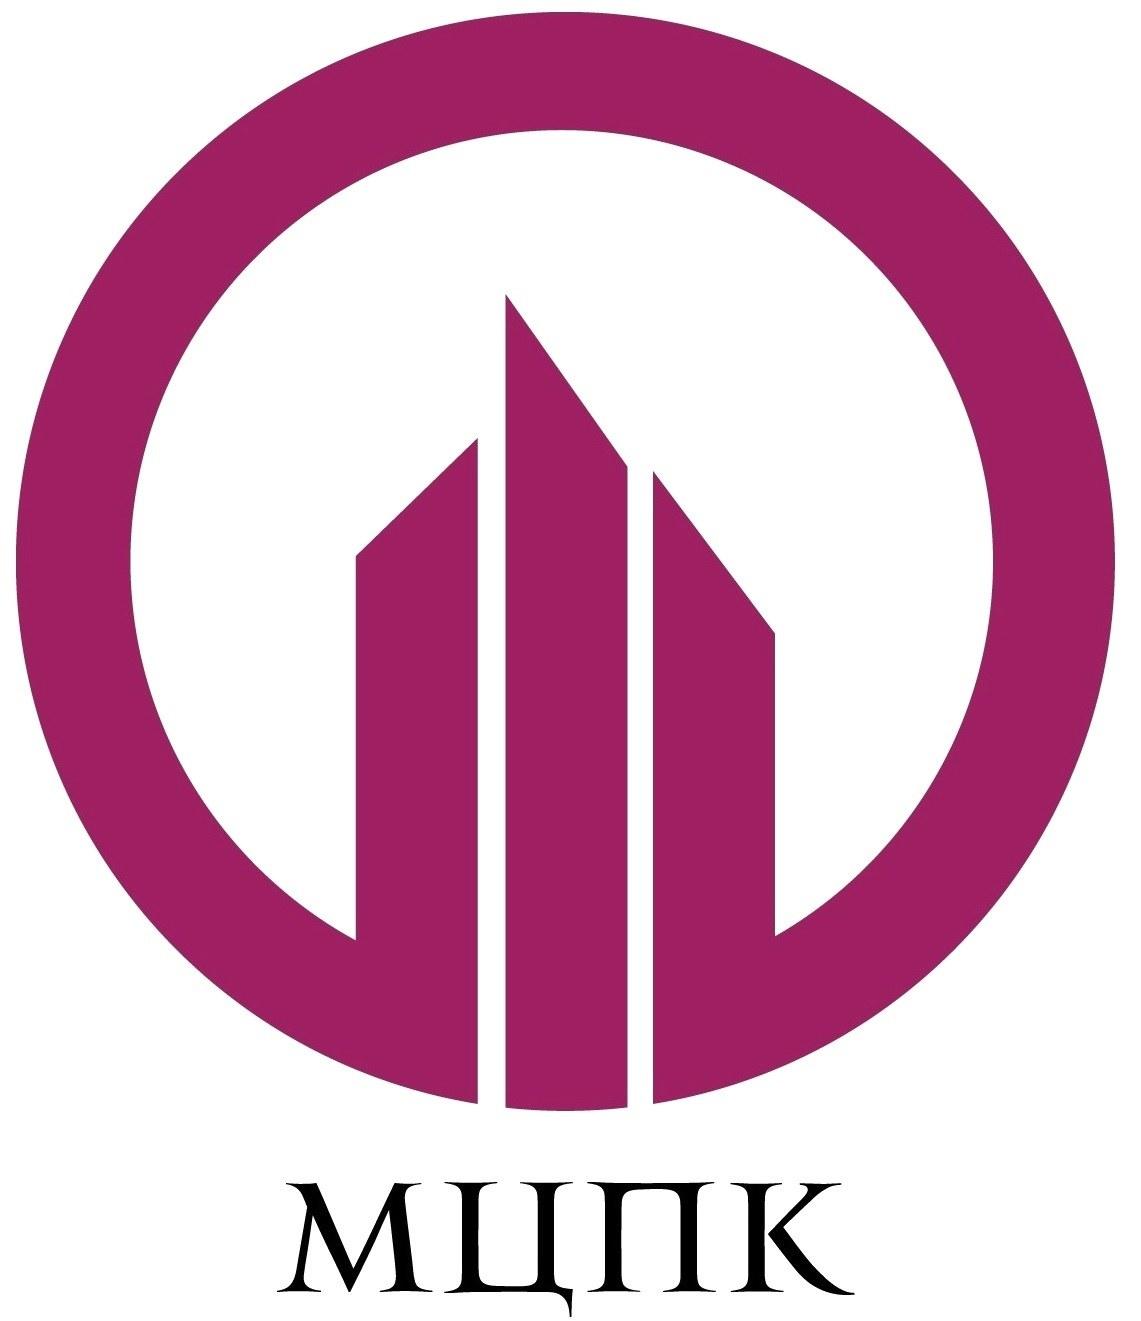 logo mcpk 16